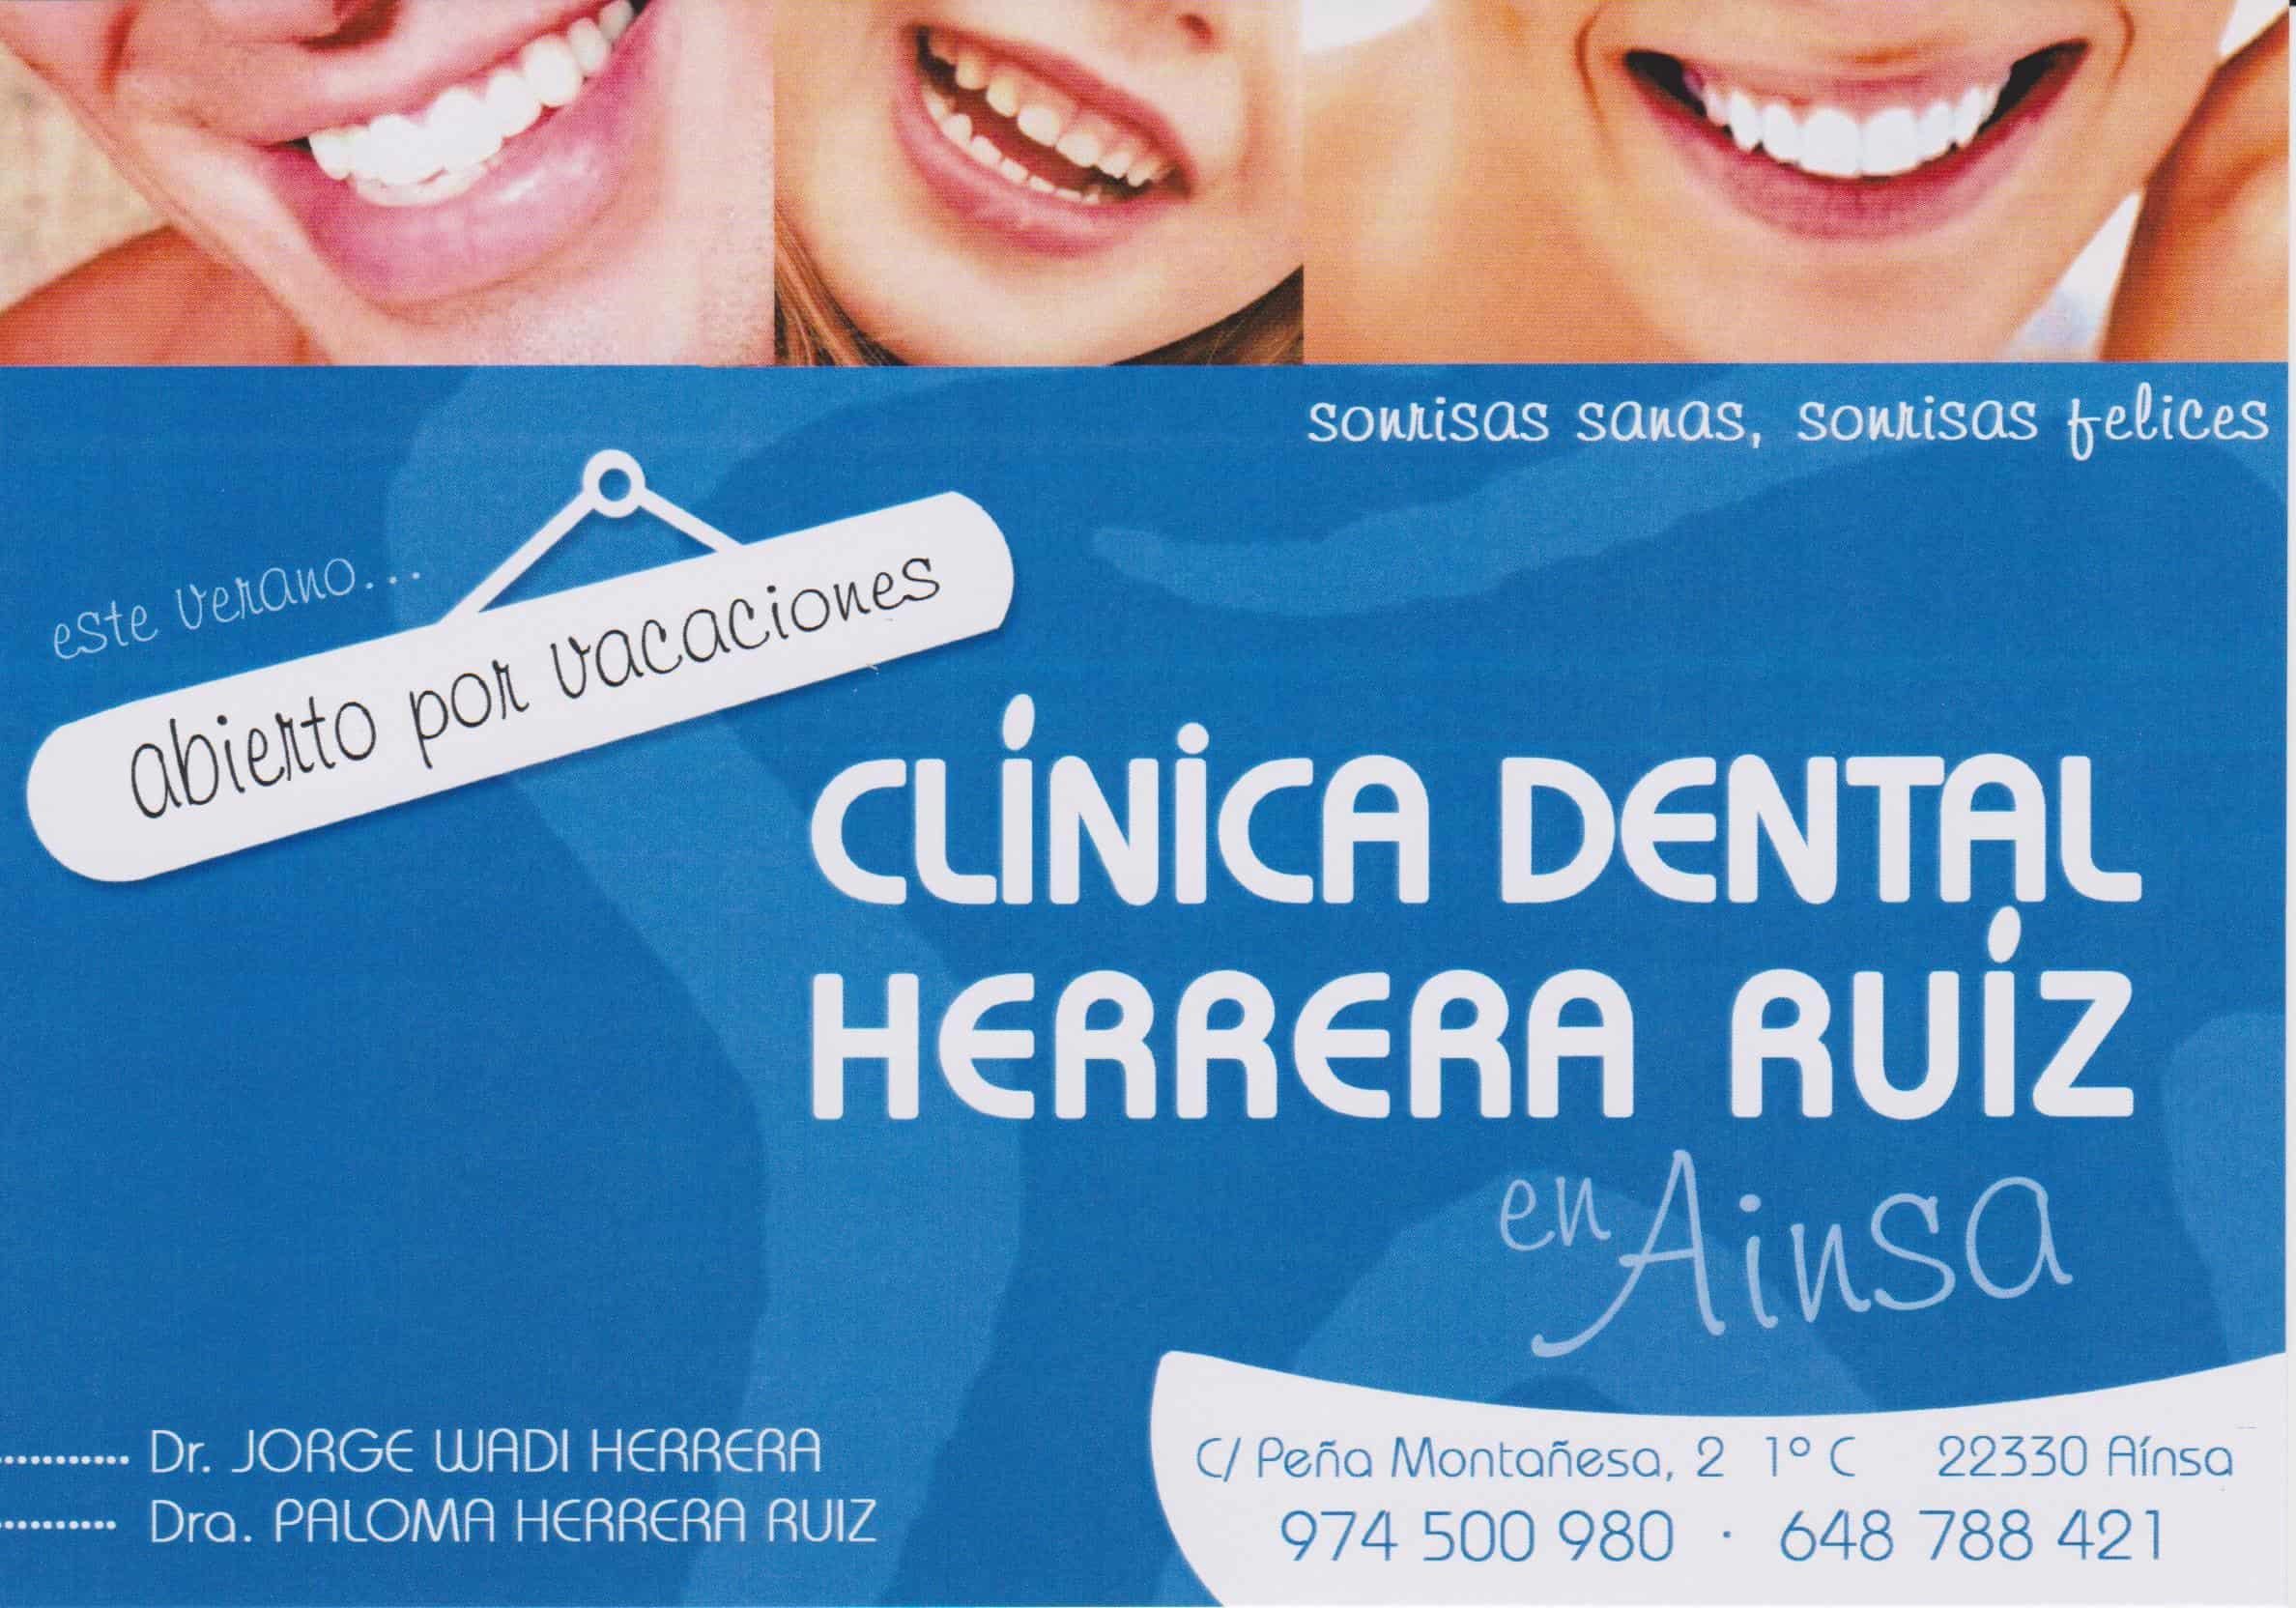 Clinica Dental Herrera Ruiz